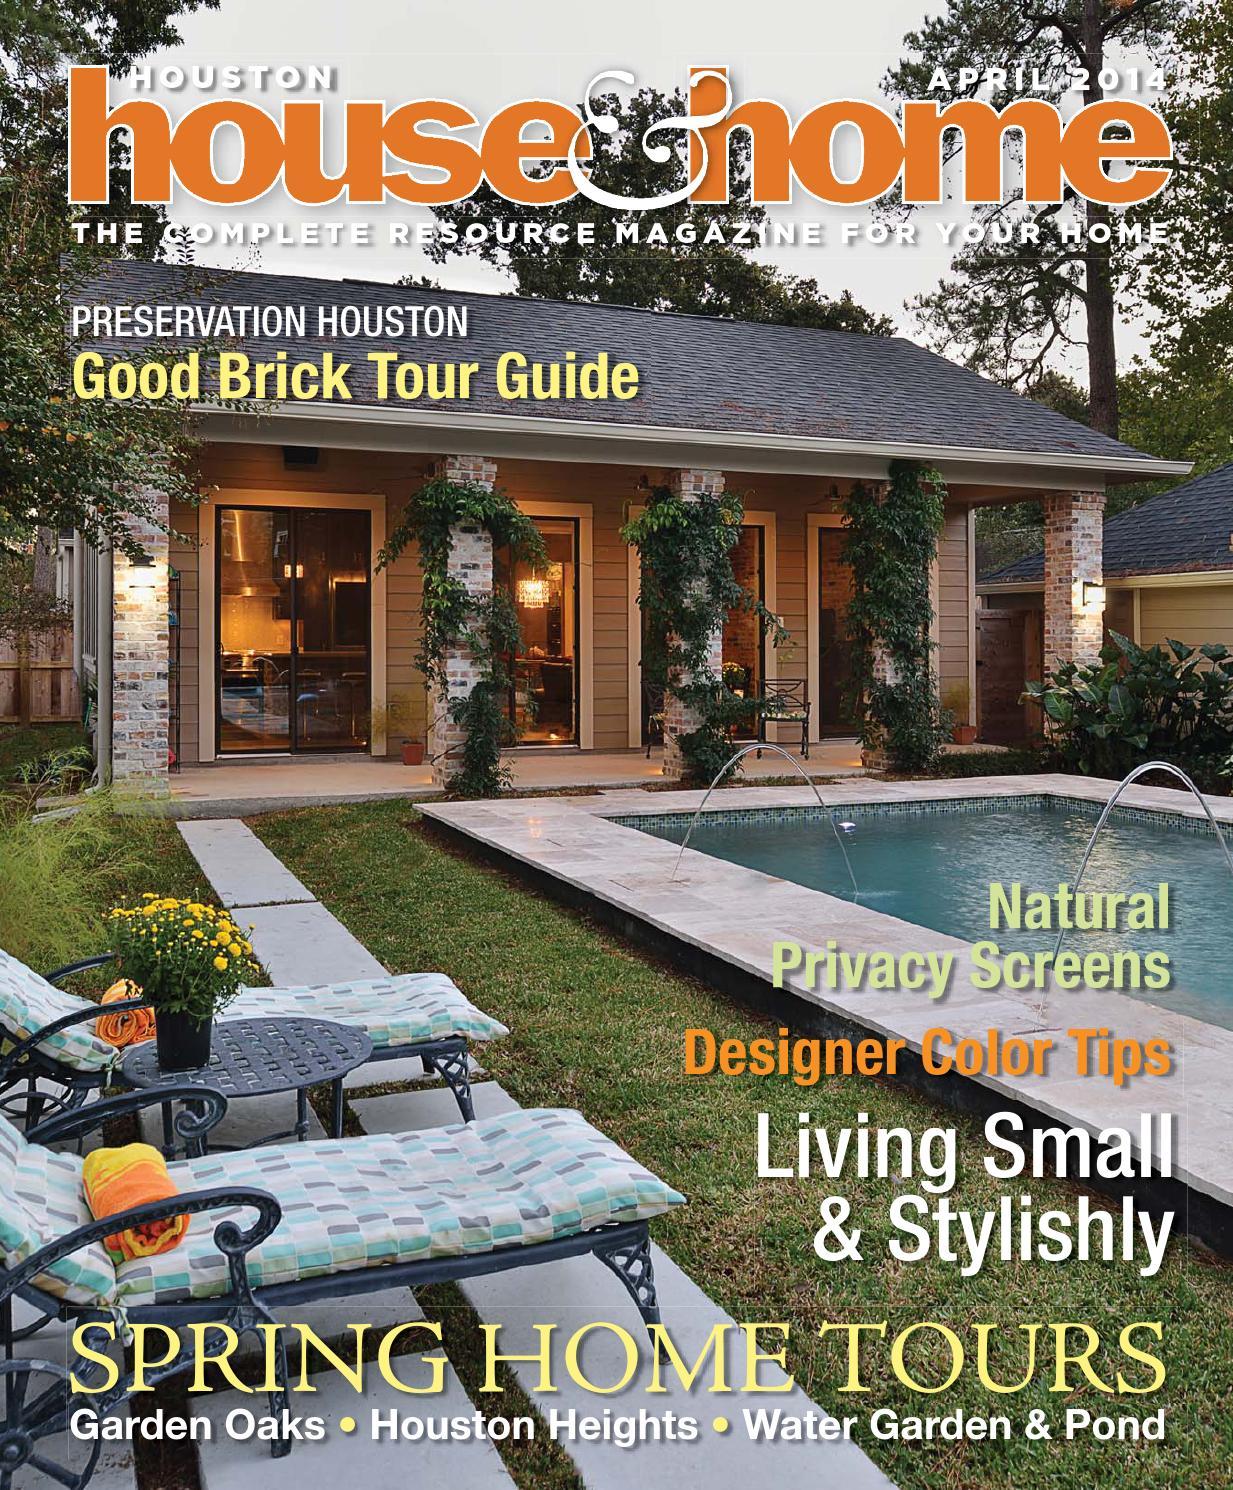 0414 houhousehome vir by houston house & home magazine - issuu